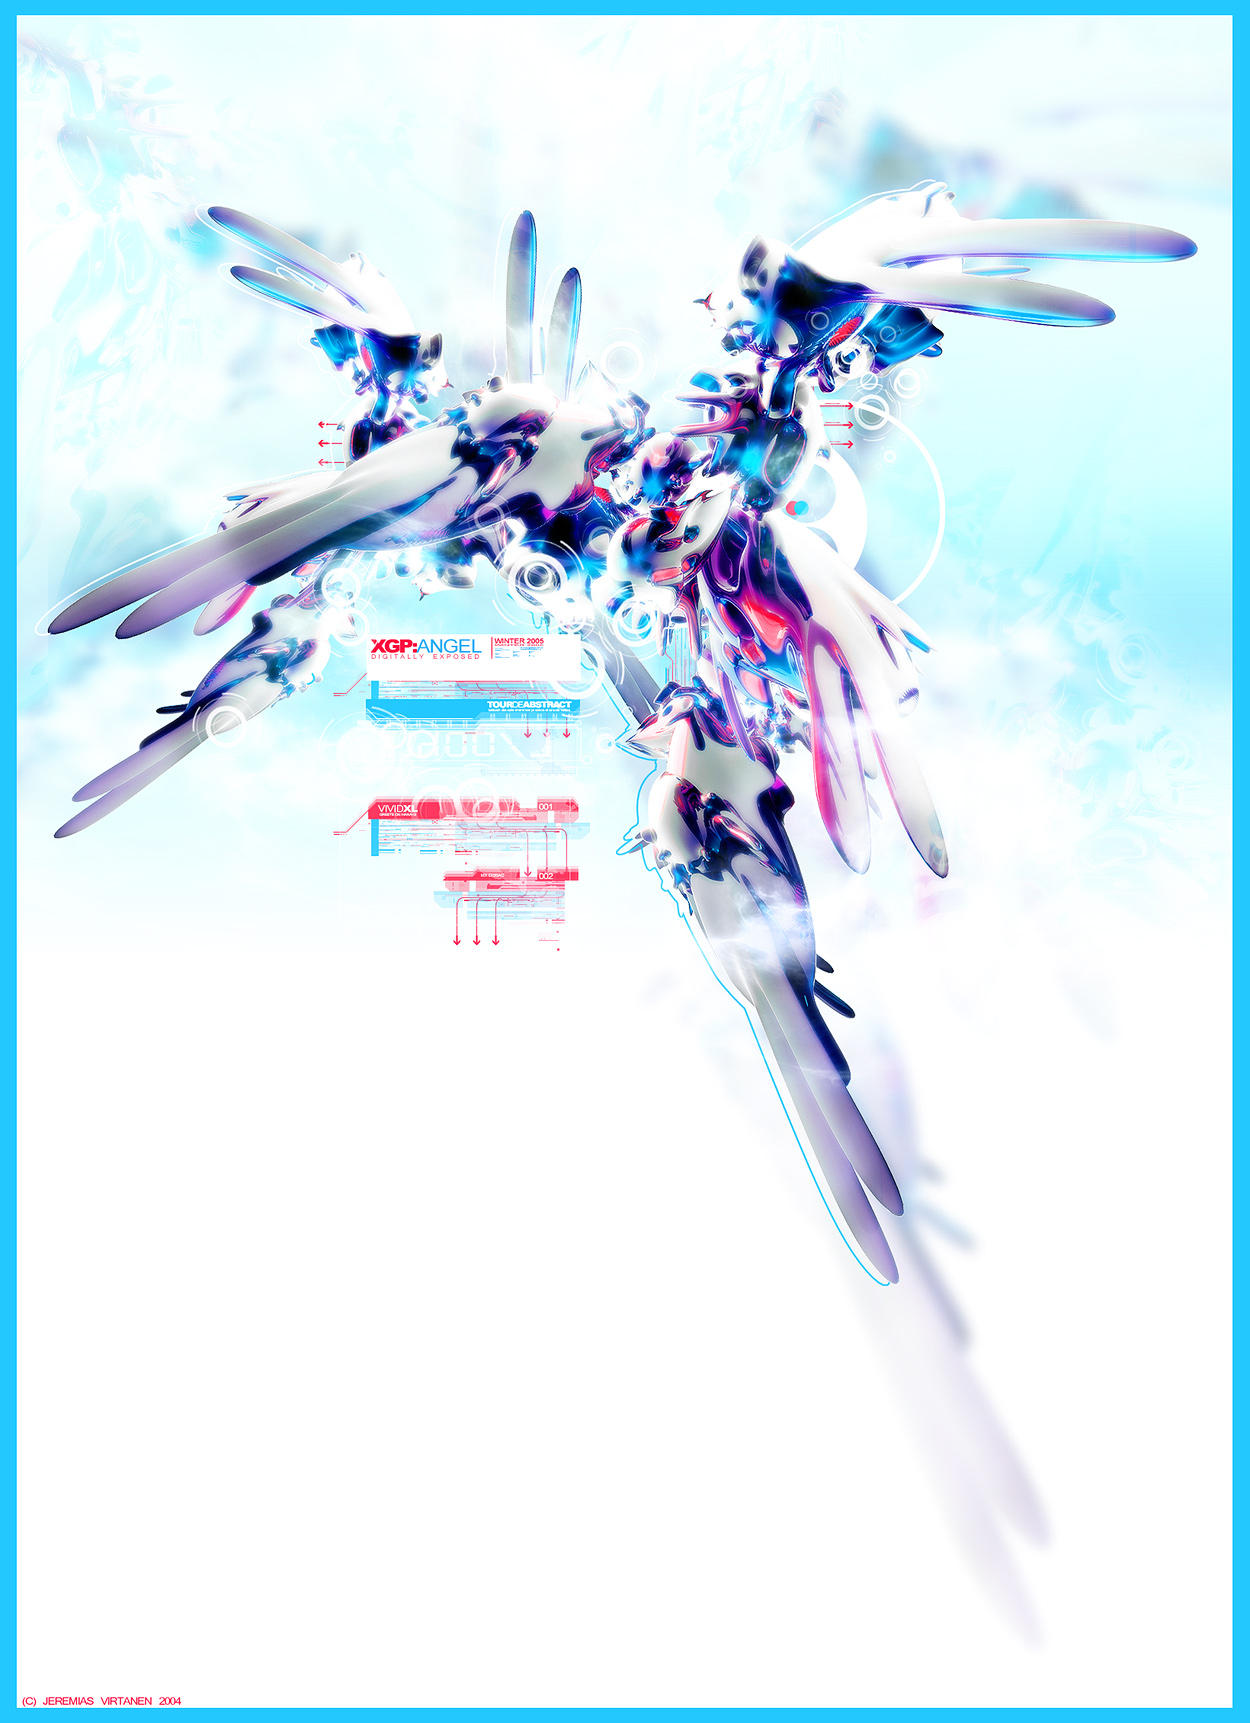 XGP:ANGEL by videa